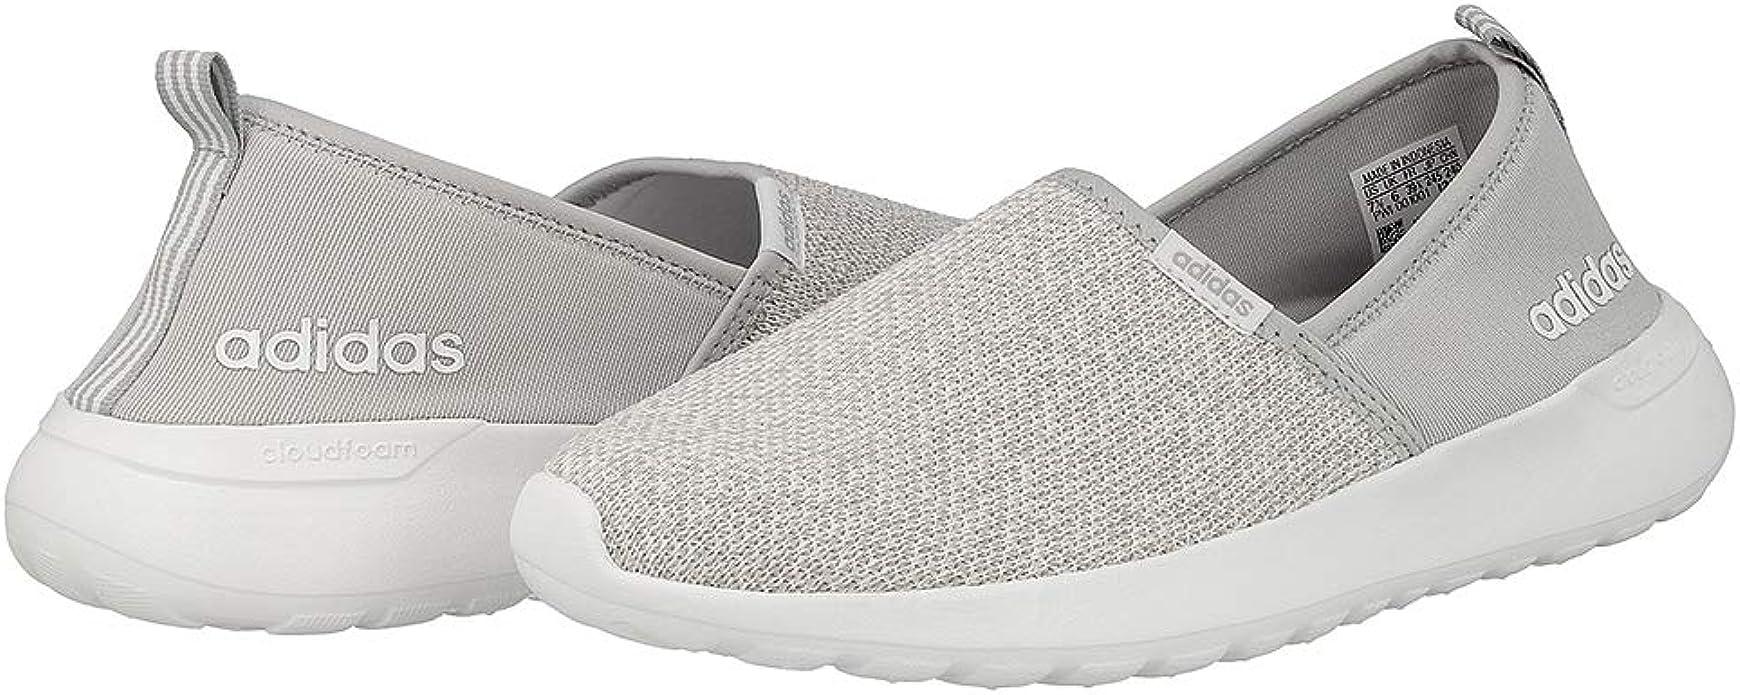 Adidas neo lite racer | Adidas shoes women, Adidas shoes